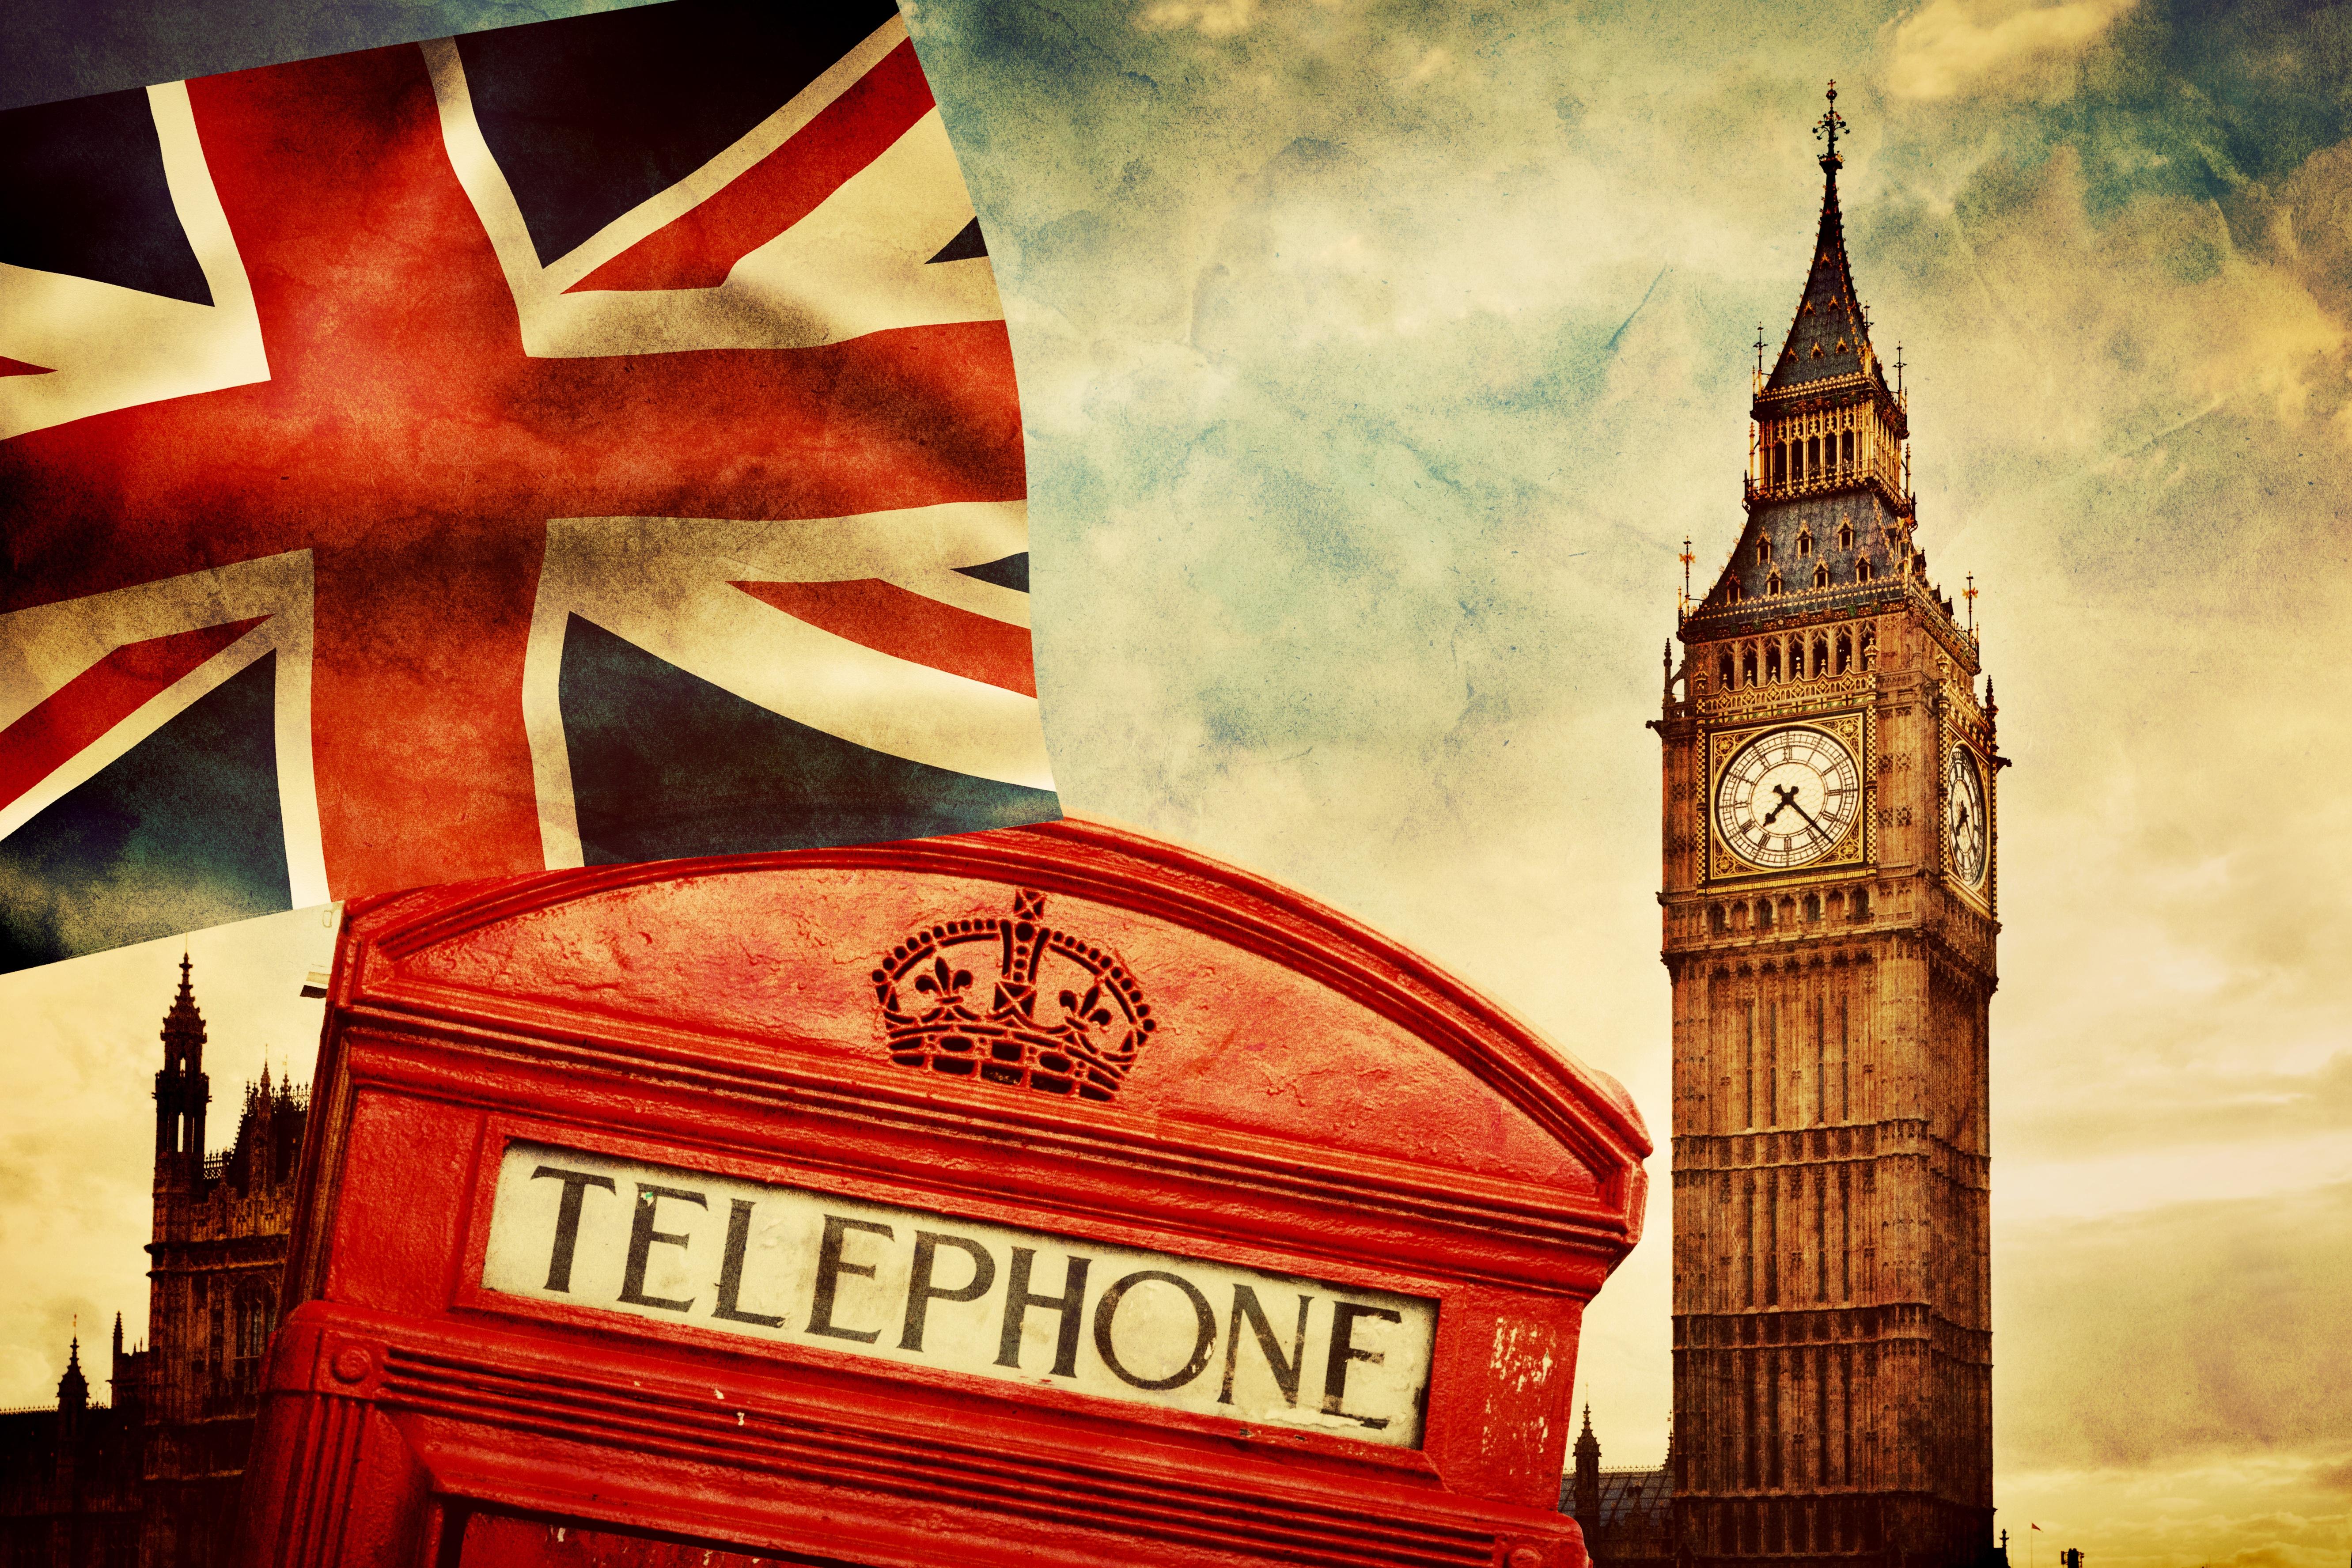 england london telephone vintage british flag big ben 5325x3550